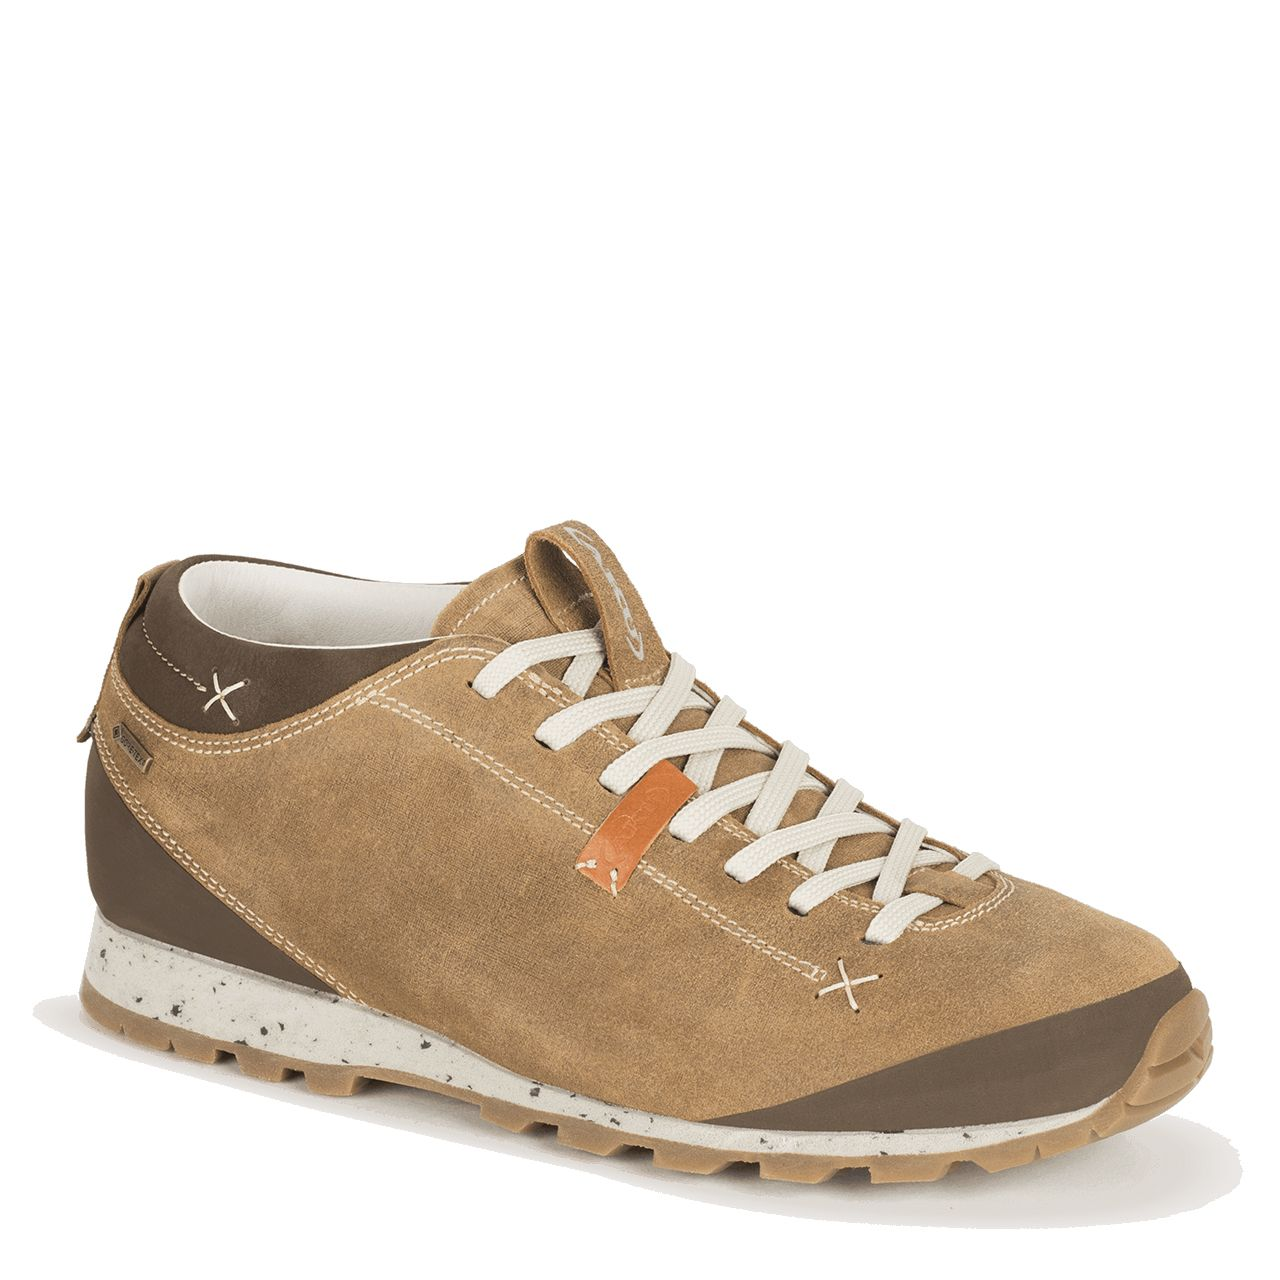 AKU Bellamont Lux GTX Dark Beige Outdoorová obuv